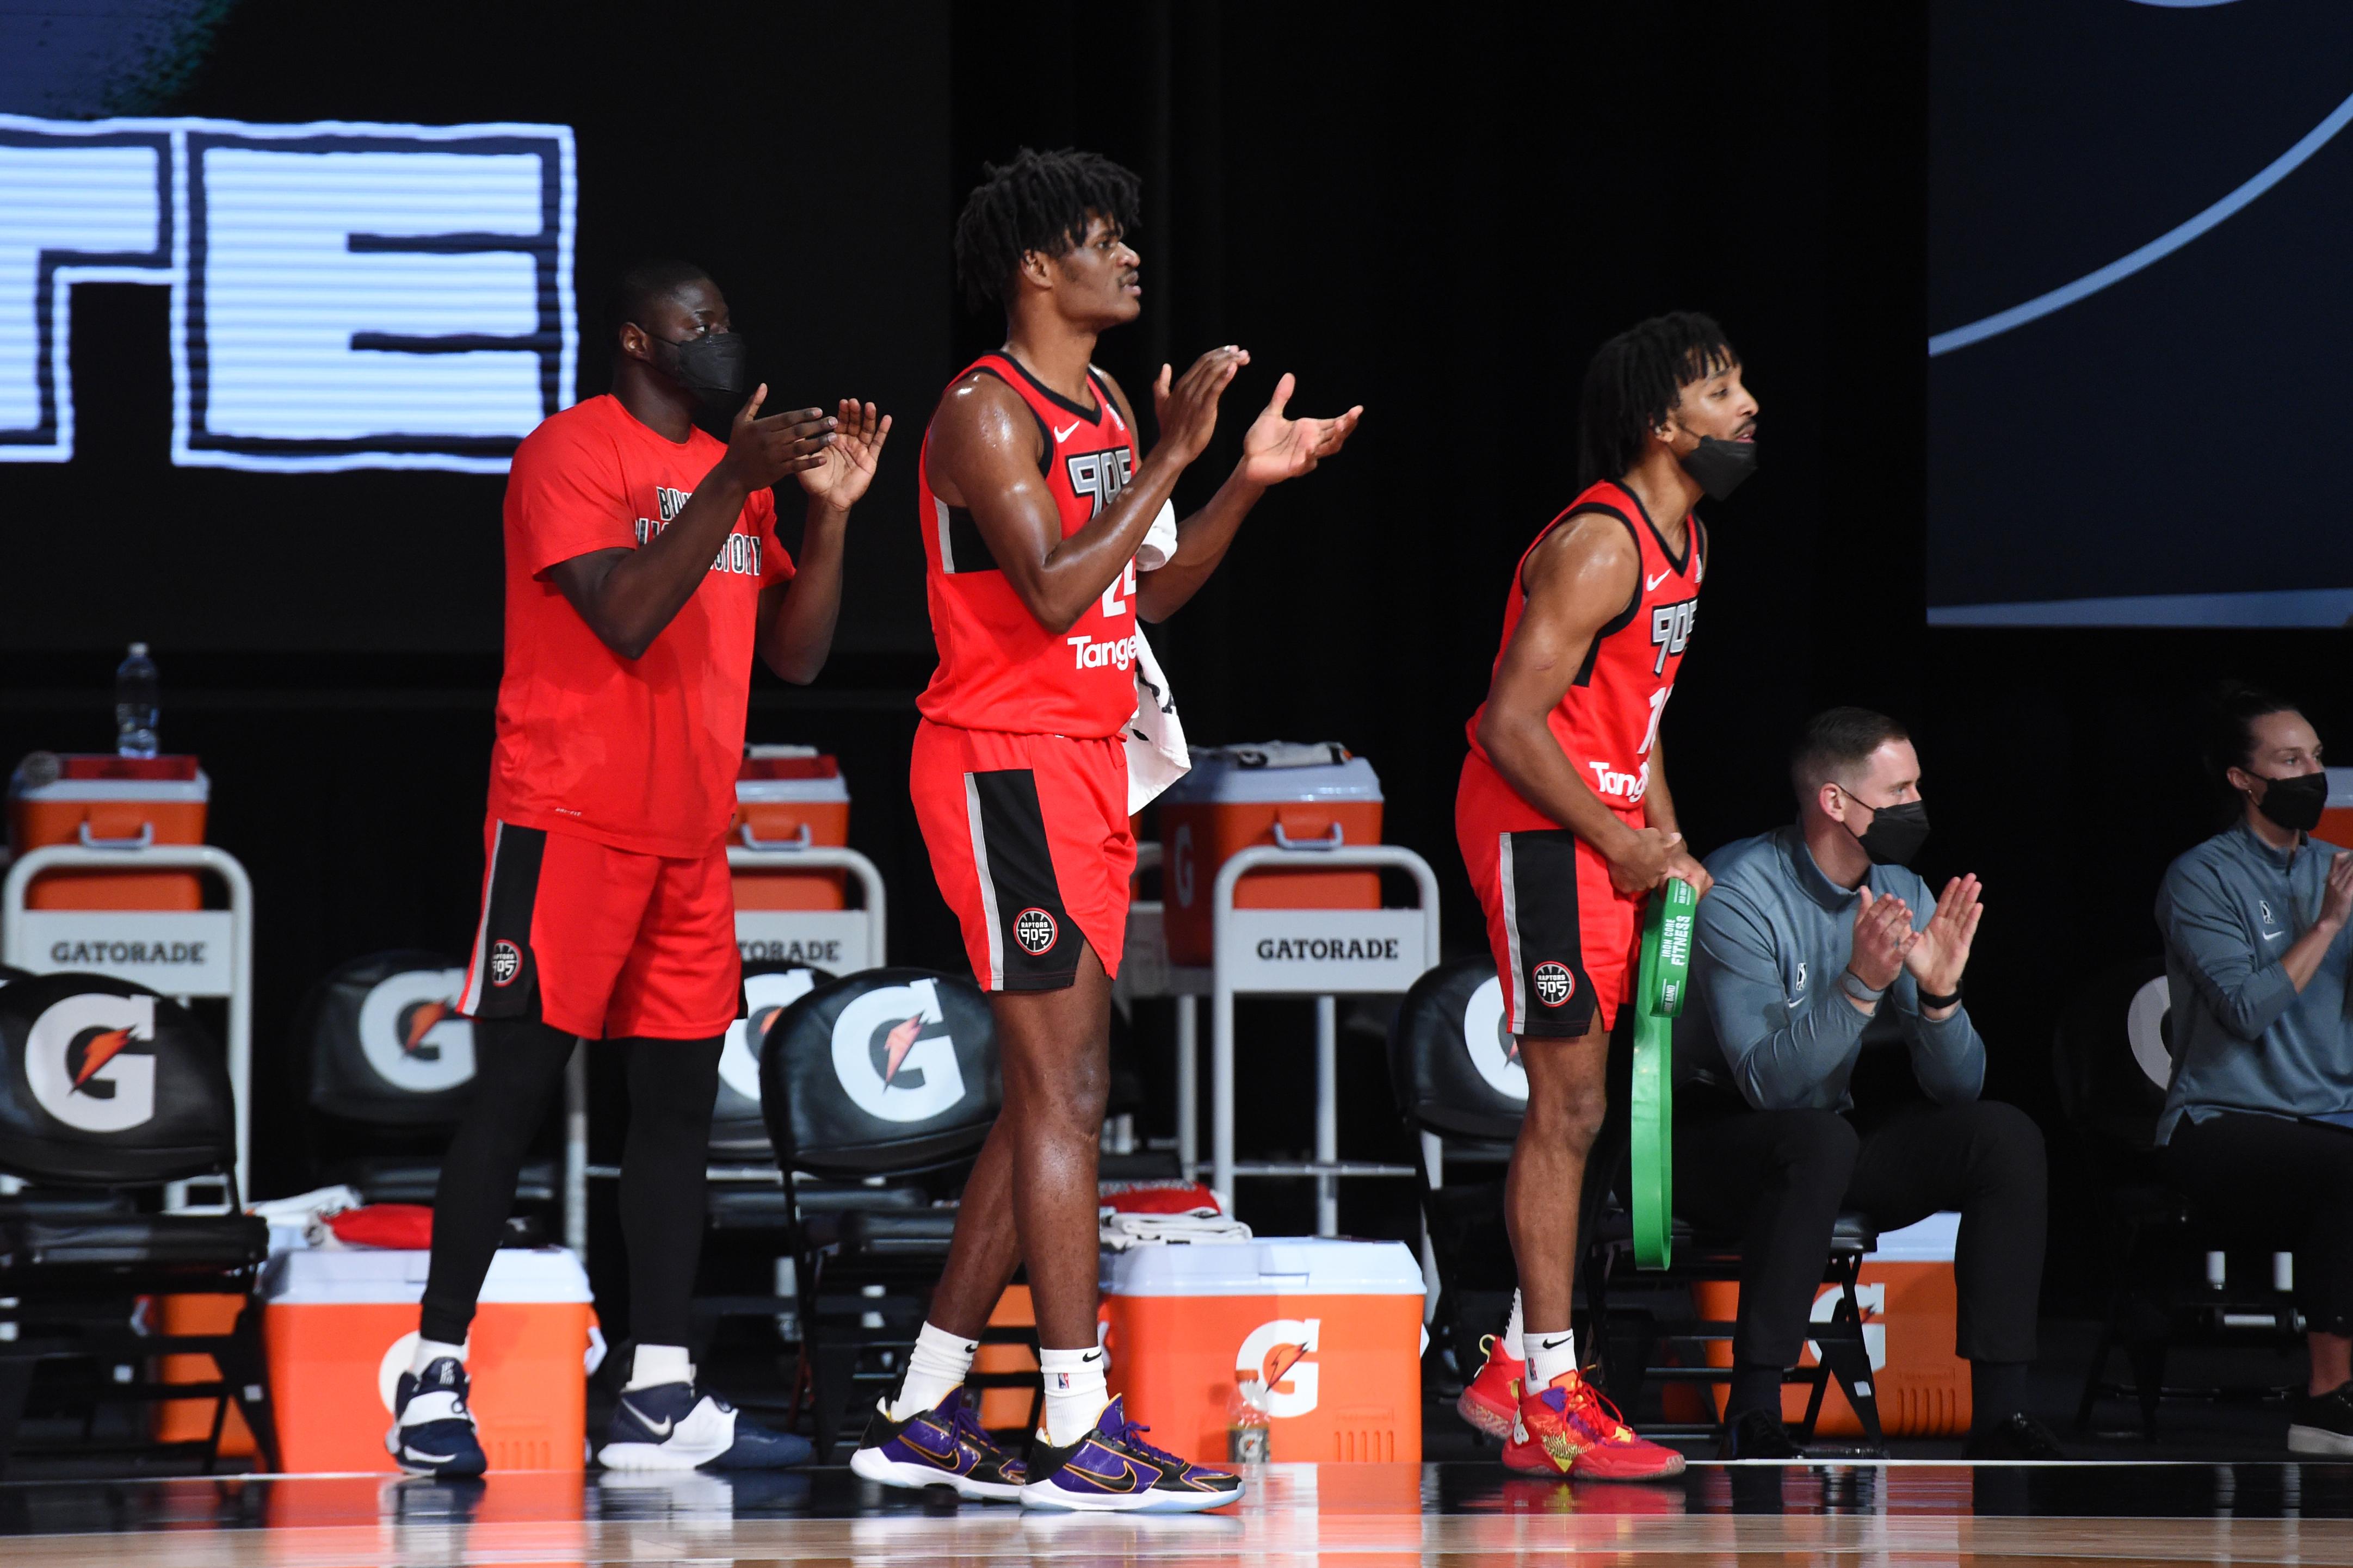 NBA G League Playoffs - G League Ignite v Raptors 905